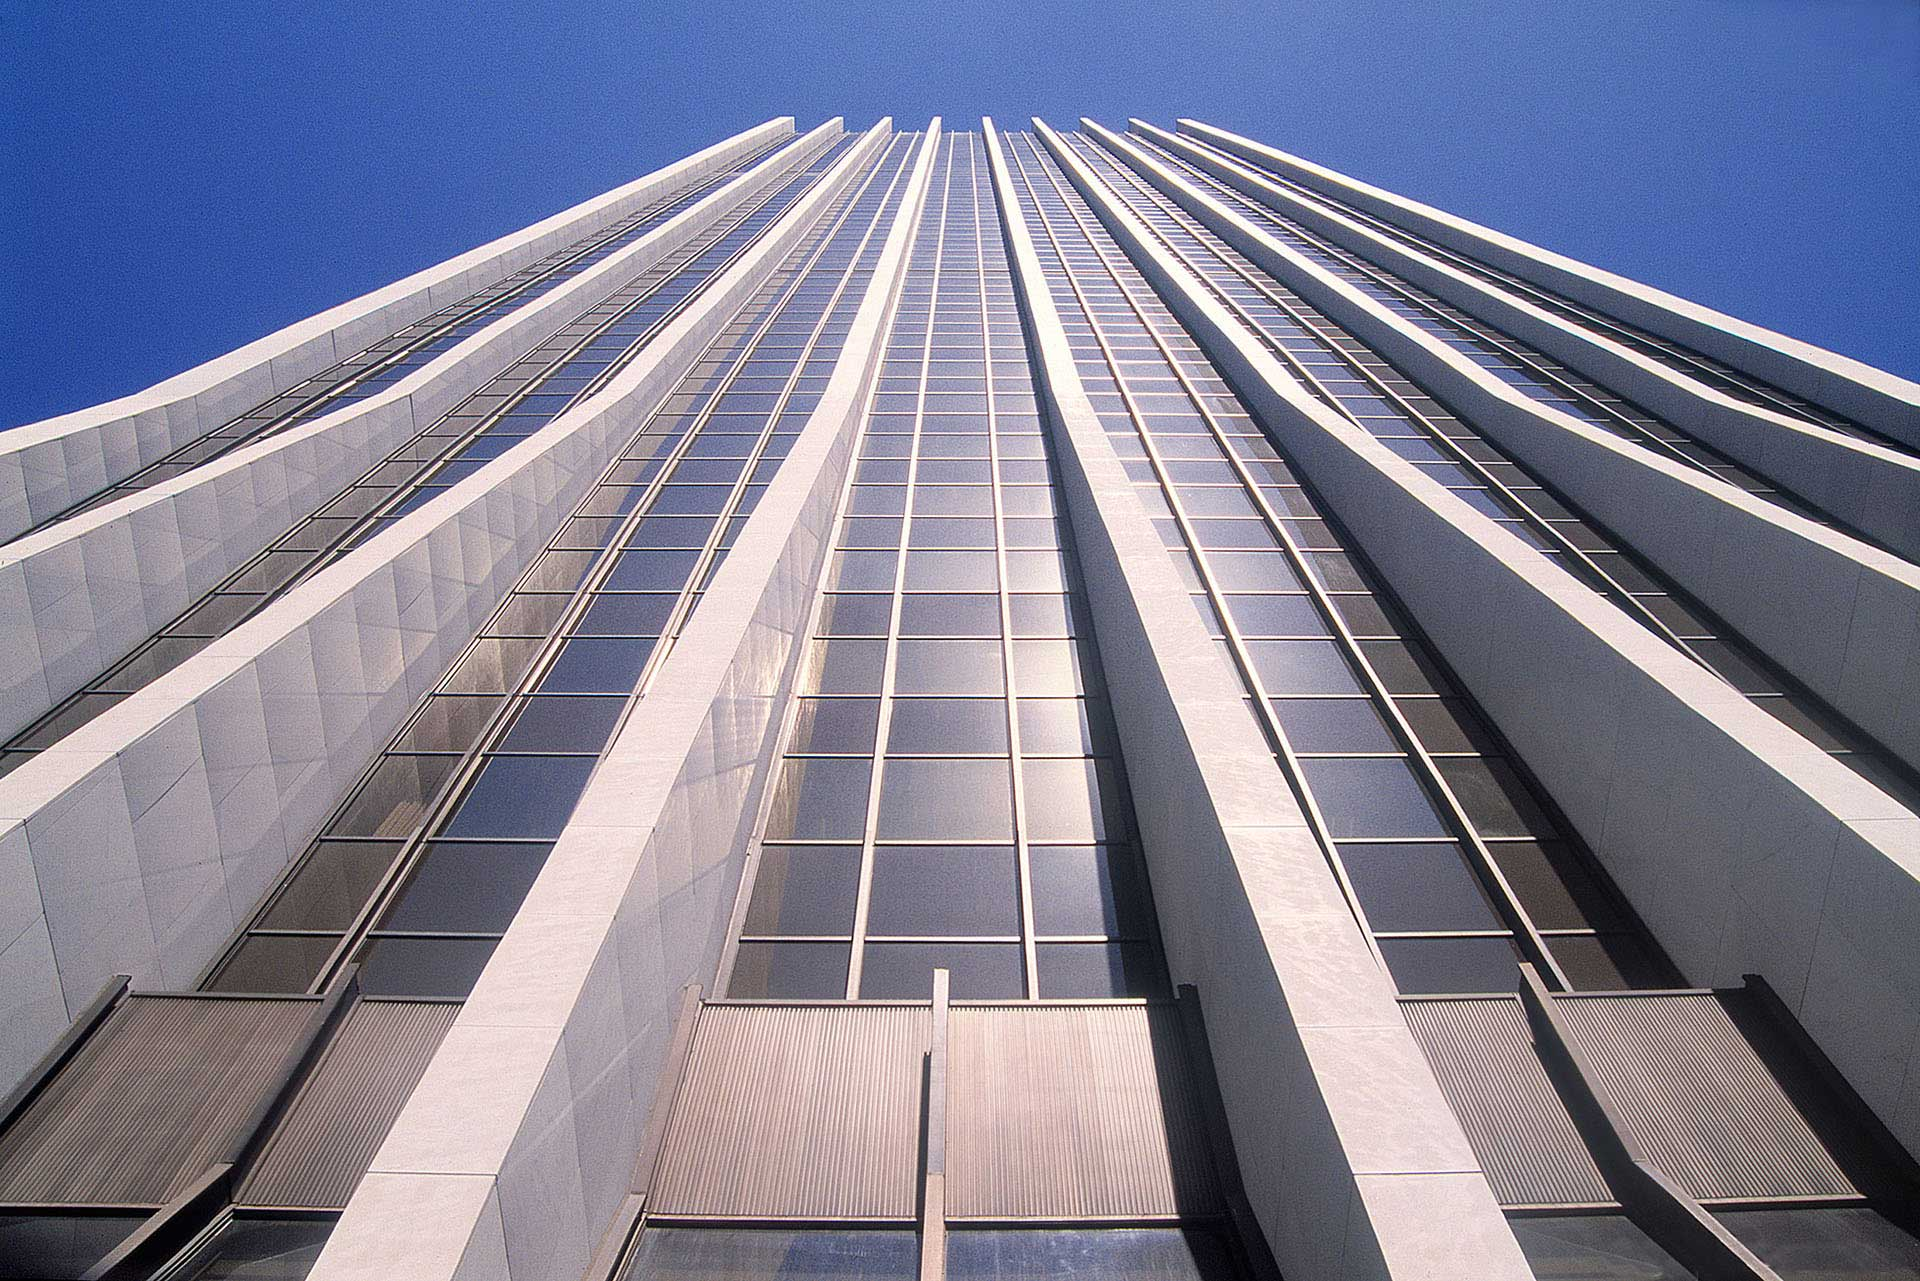 architecture-exterior-portland-oregon-wells-fargo-building_w